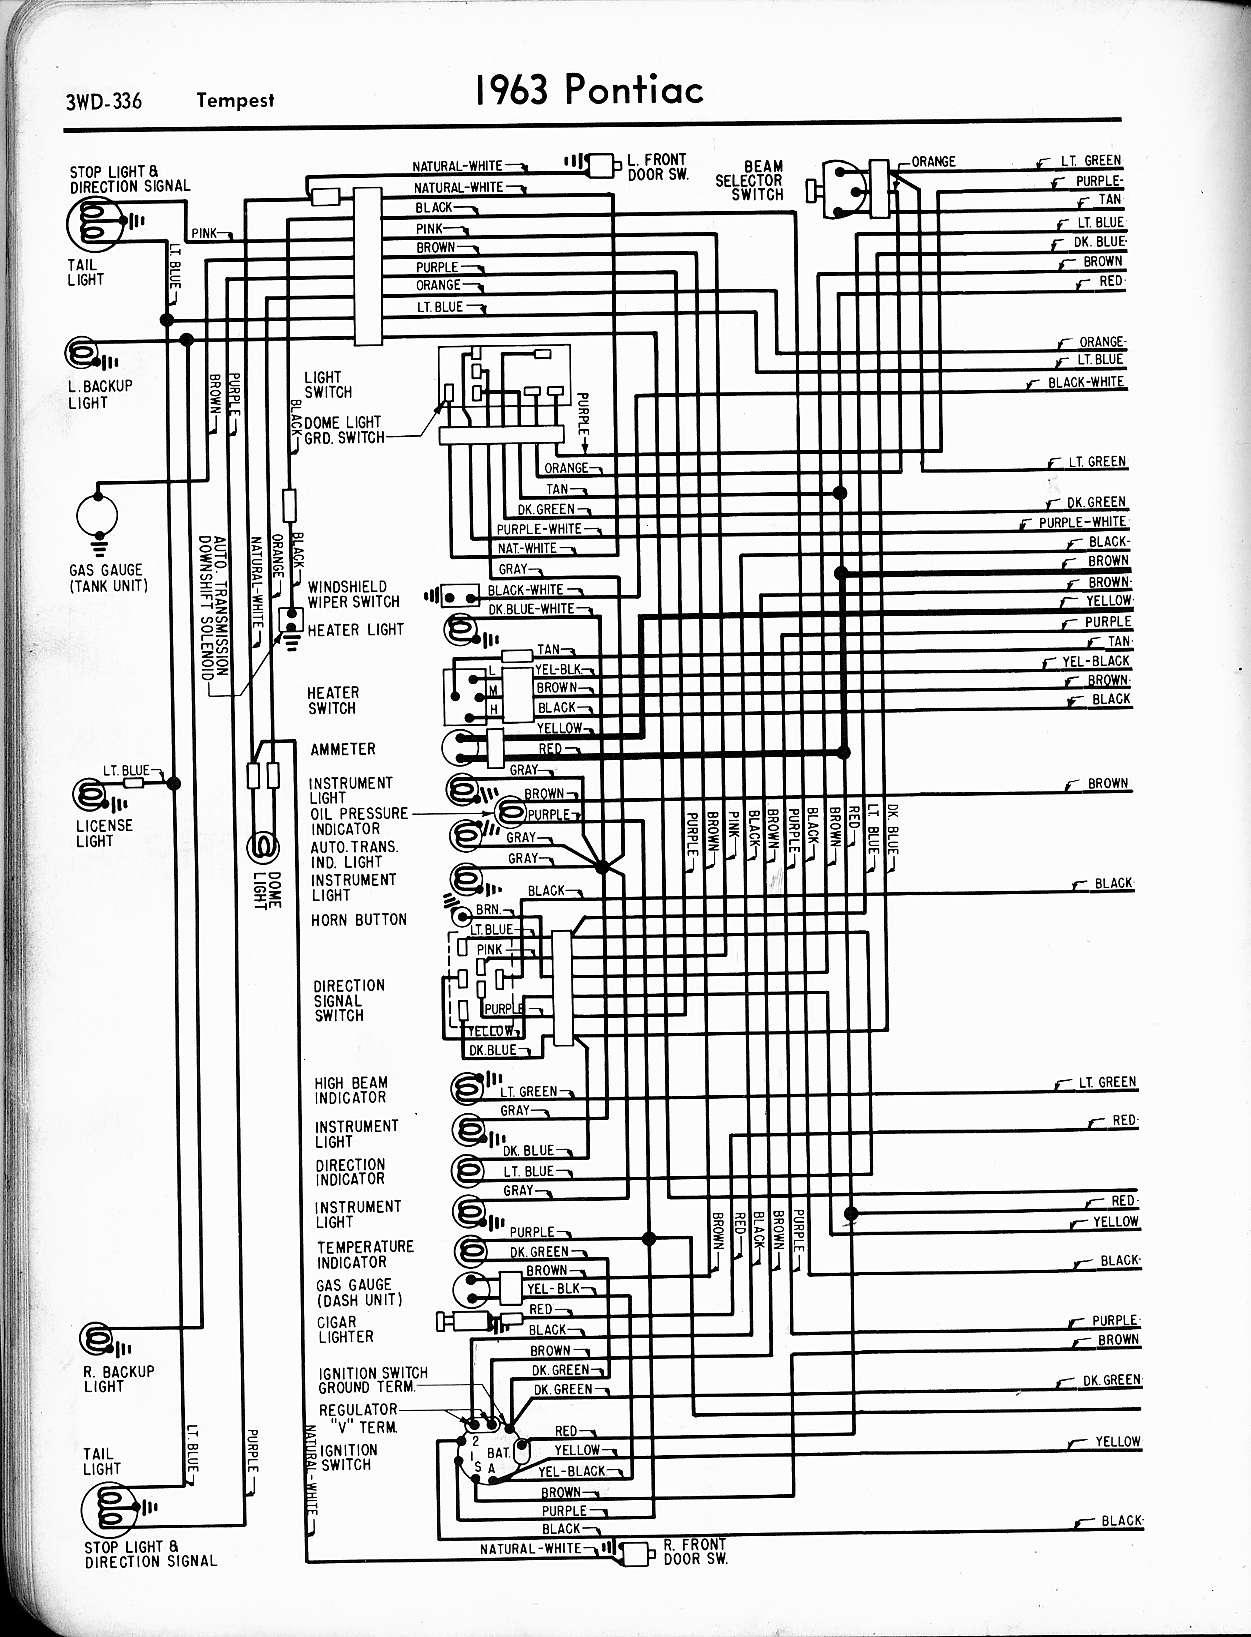 1962 pontiac wiring diagram